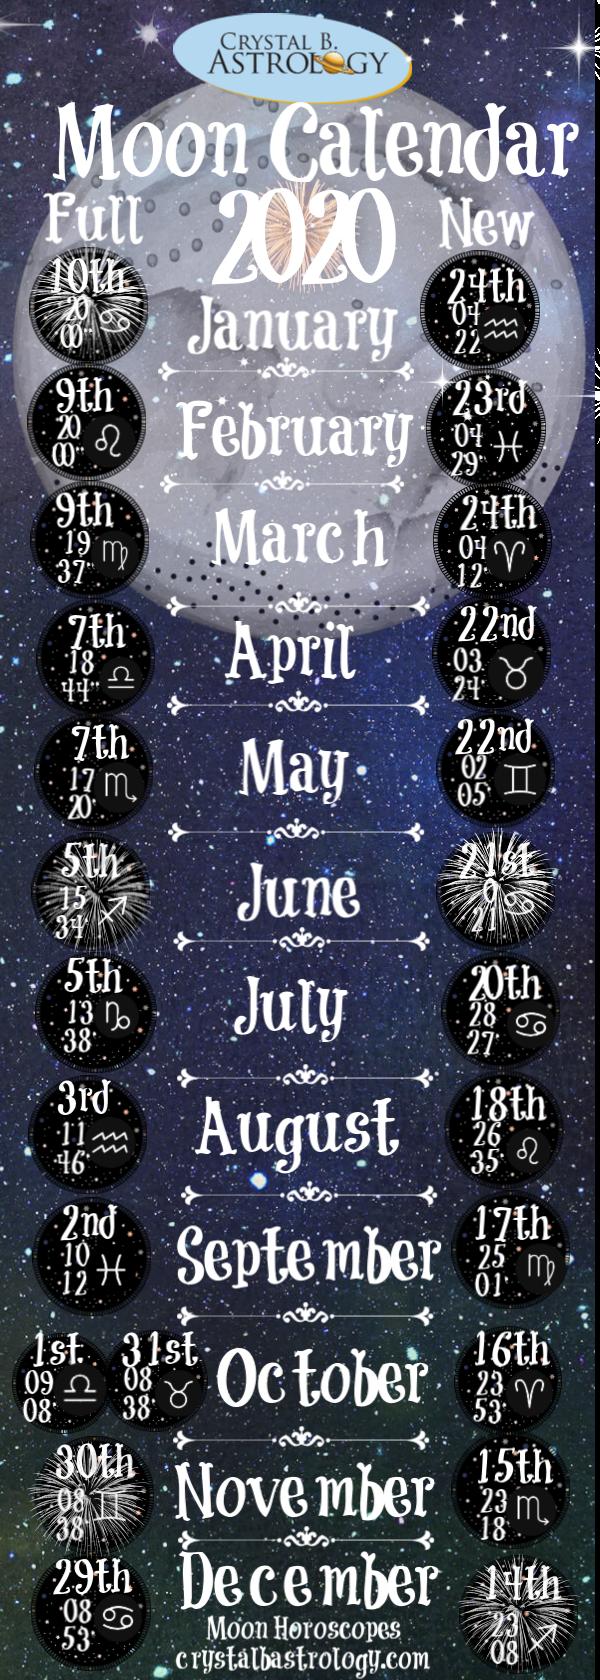 Moon Calendar 2020 #newmoonritual